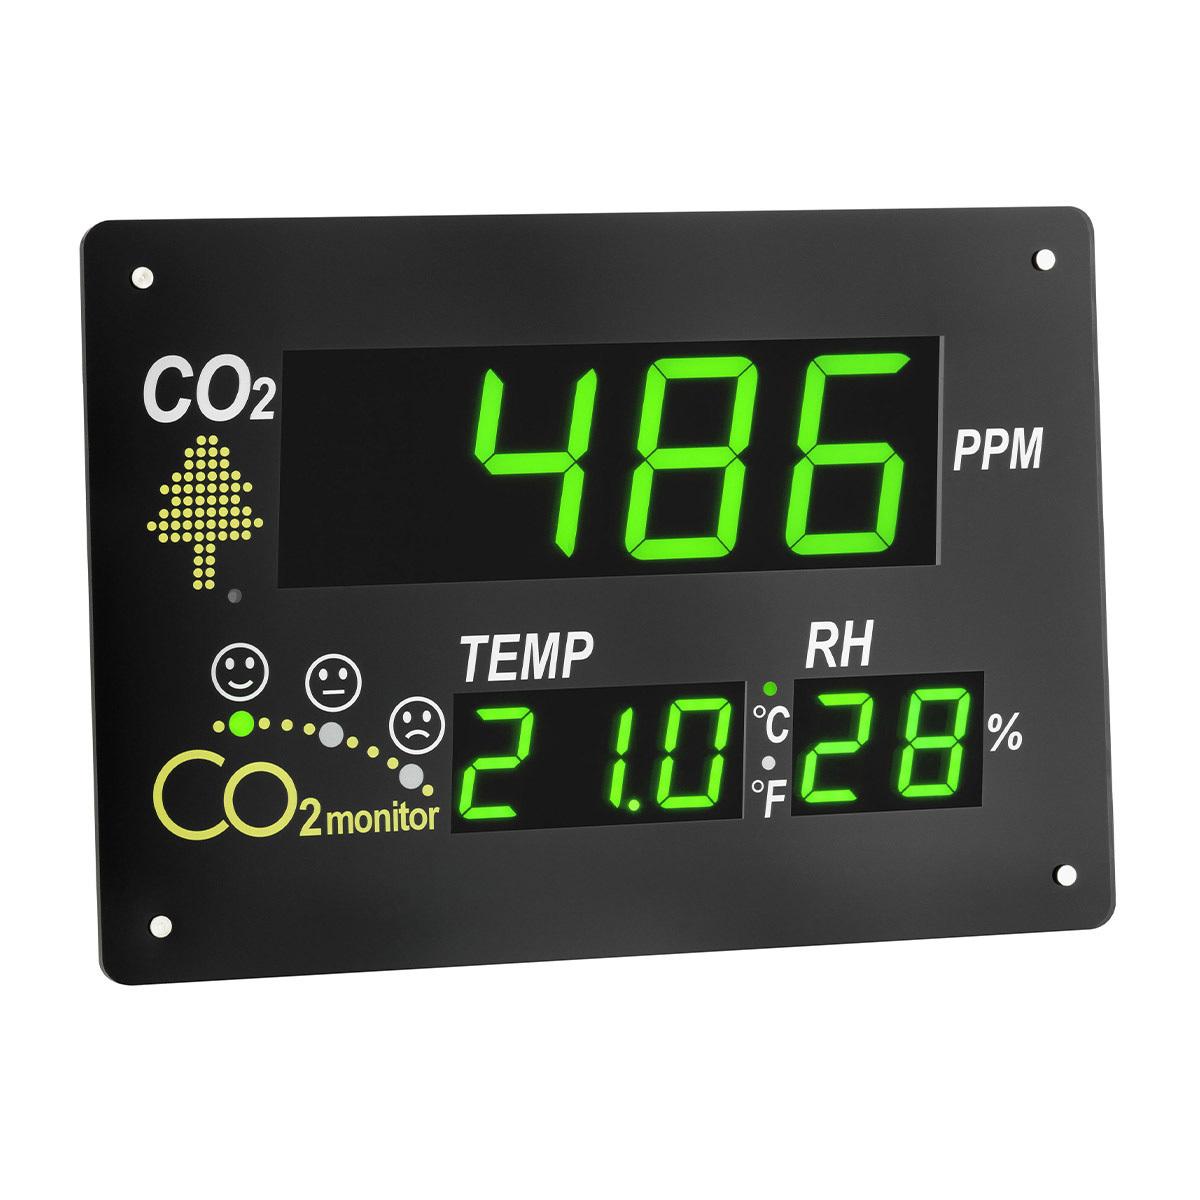 31-5002-co2-monitor-airco2ntrol-observer-1200x1200px.jpg